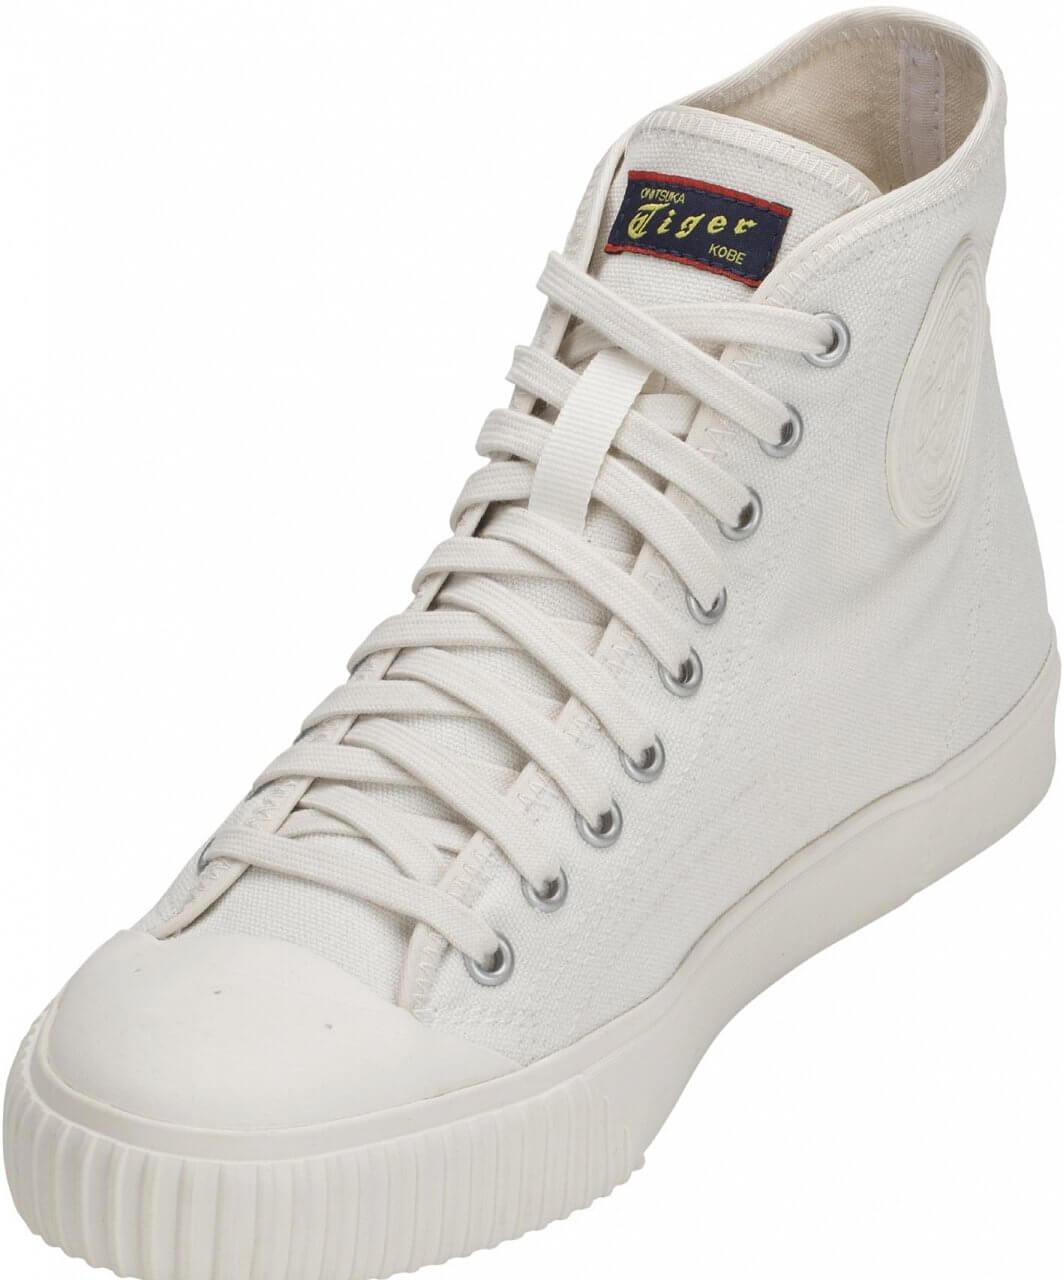 Onitsuka Tiger OK Basketball MT - fashion topánky  de77fd84ad4